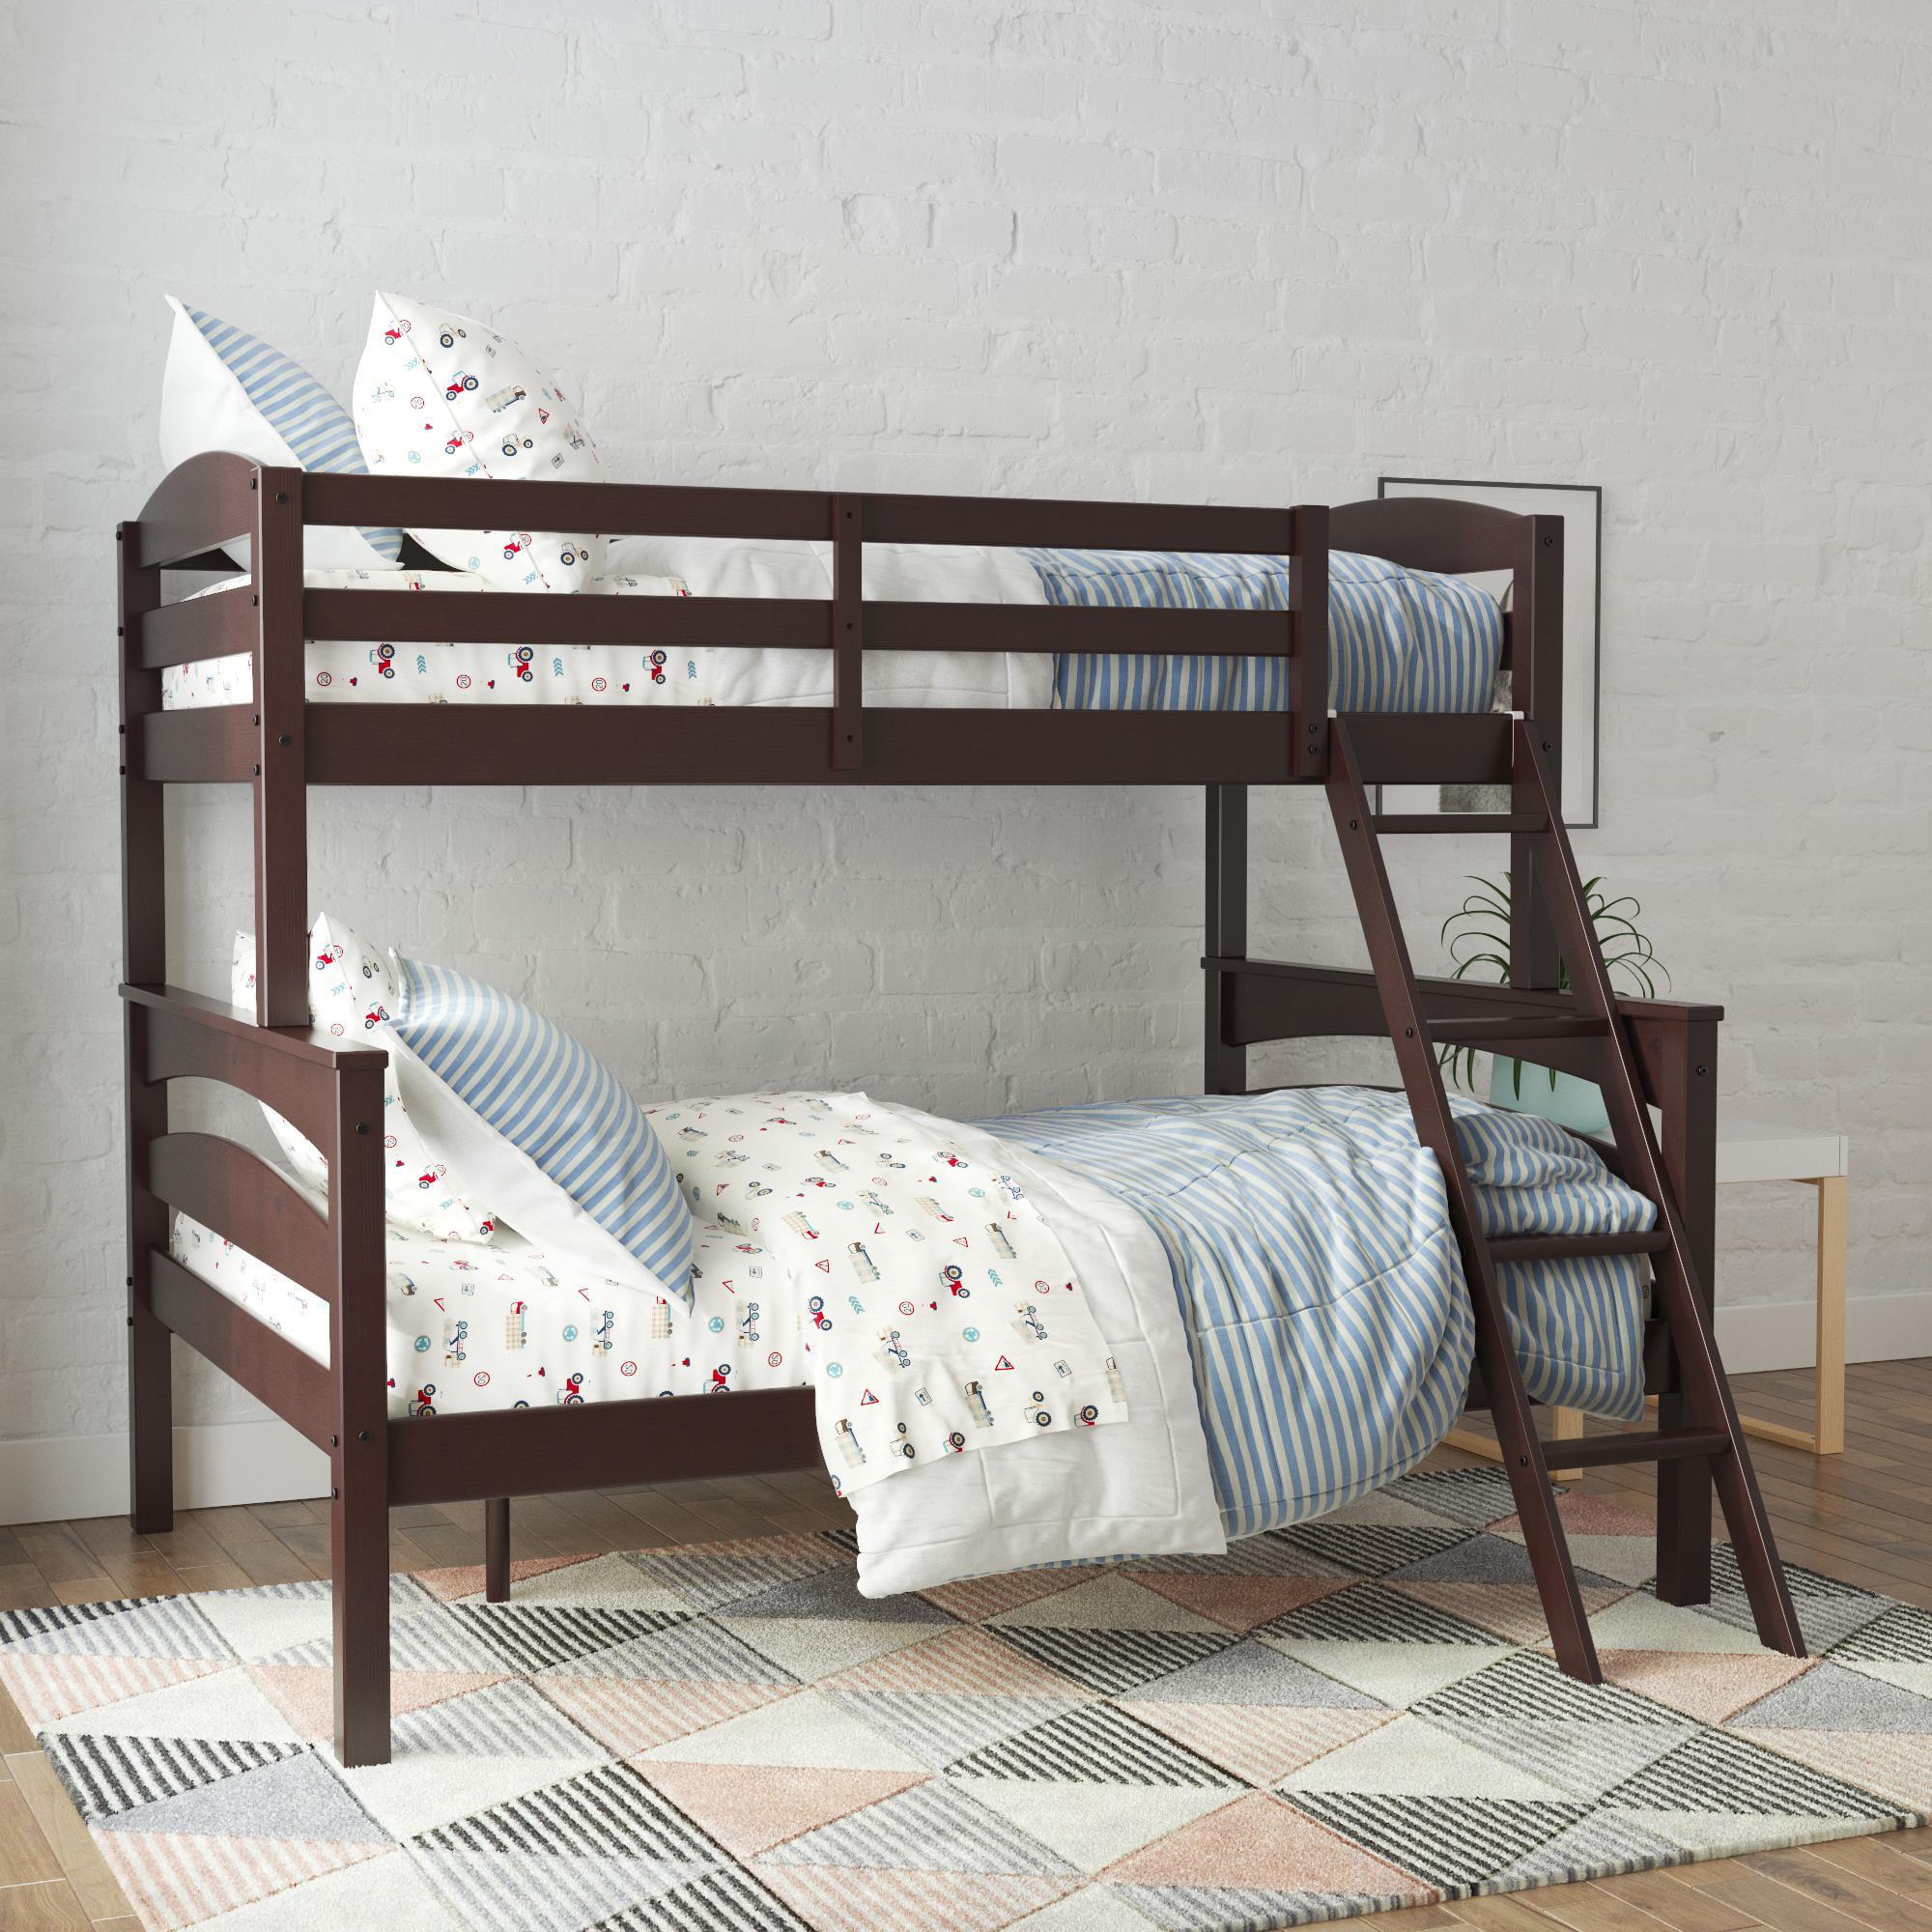 Better Homes Gardens Leighton Wood Twin Over Full Bunk Bed Espresso Walmart Com